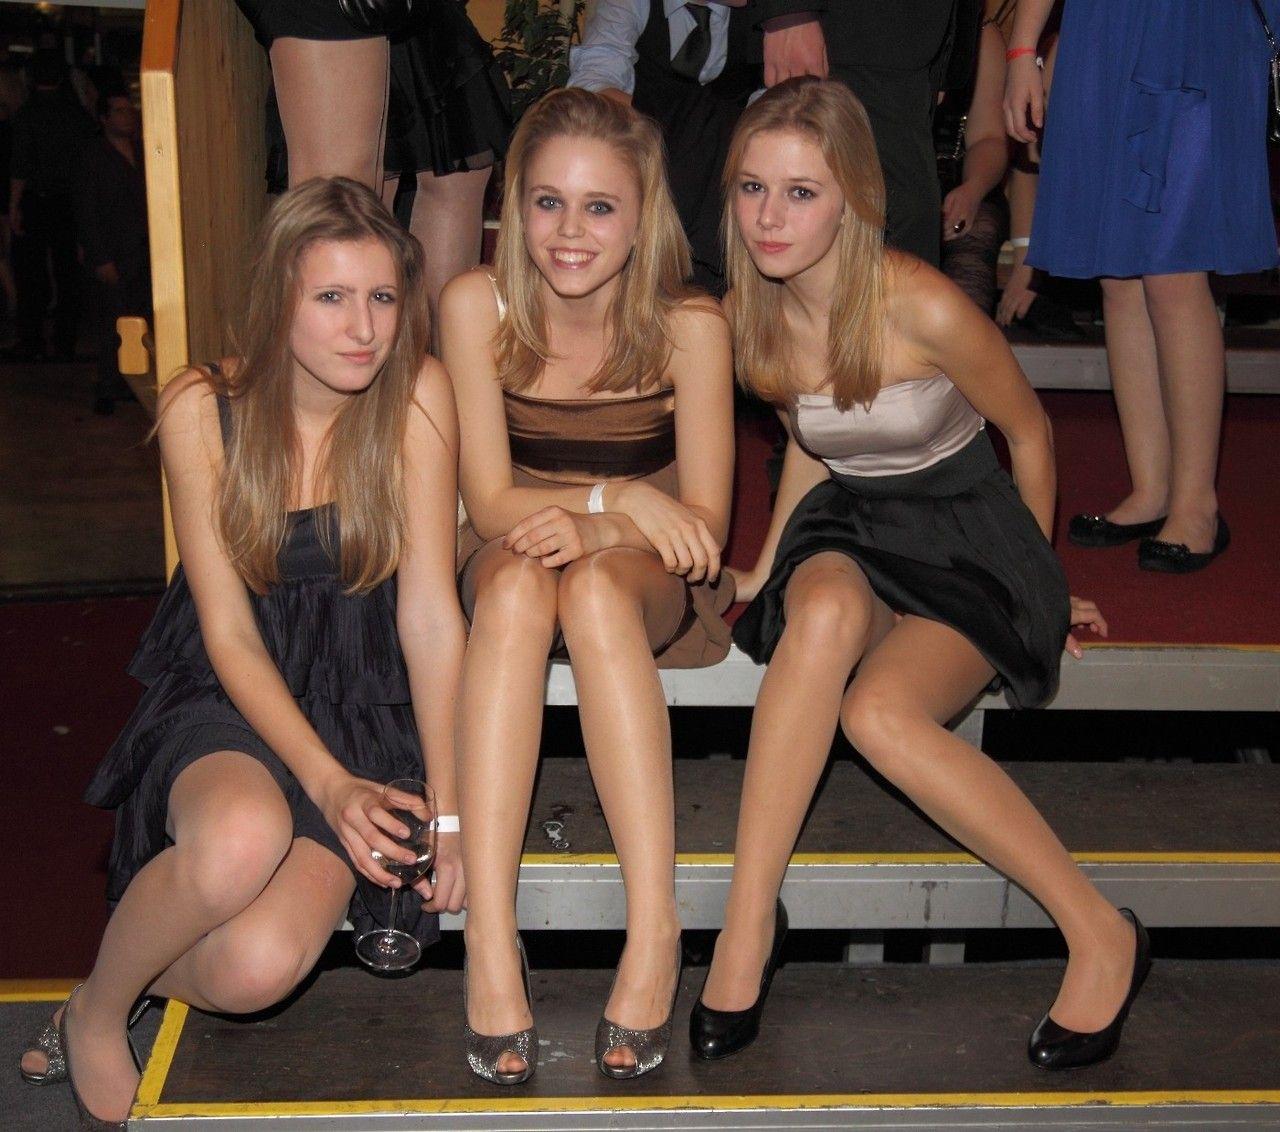 Vallarta amateur girls photos